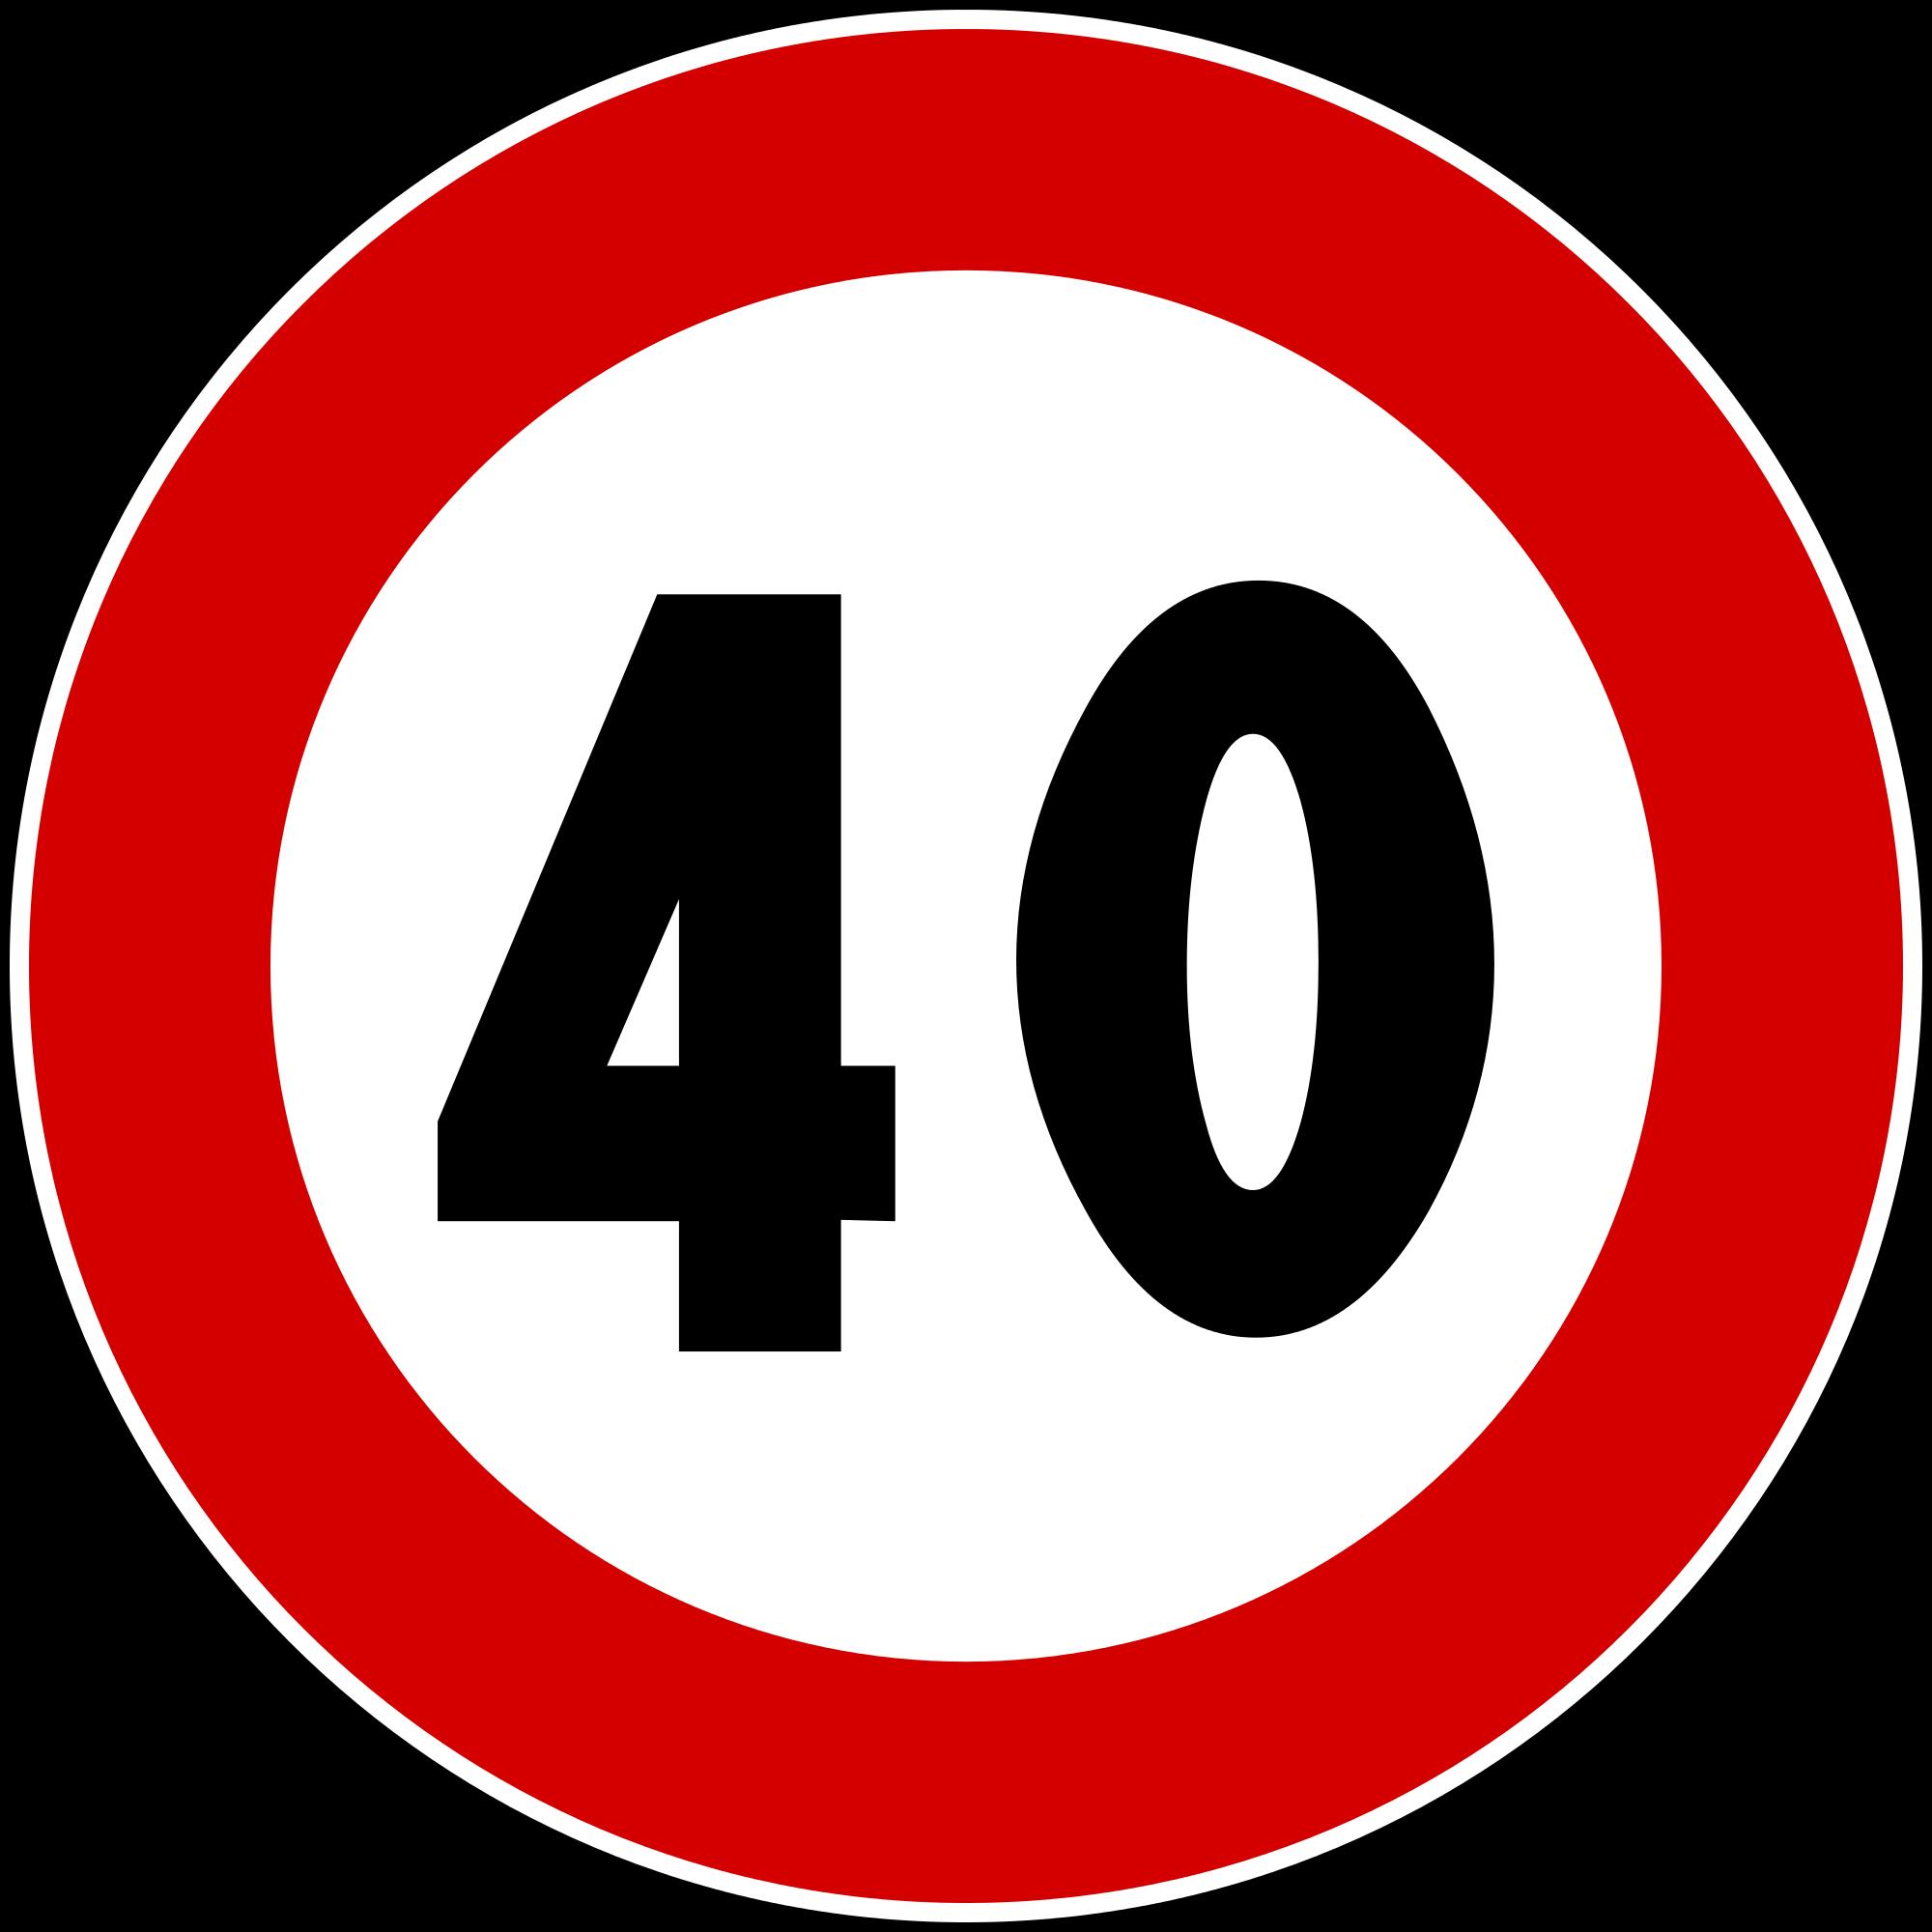 40 - Dr. Odd